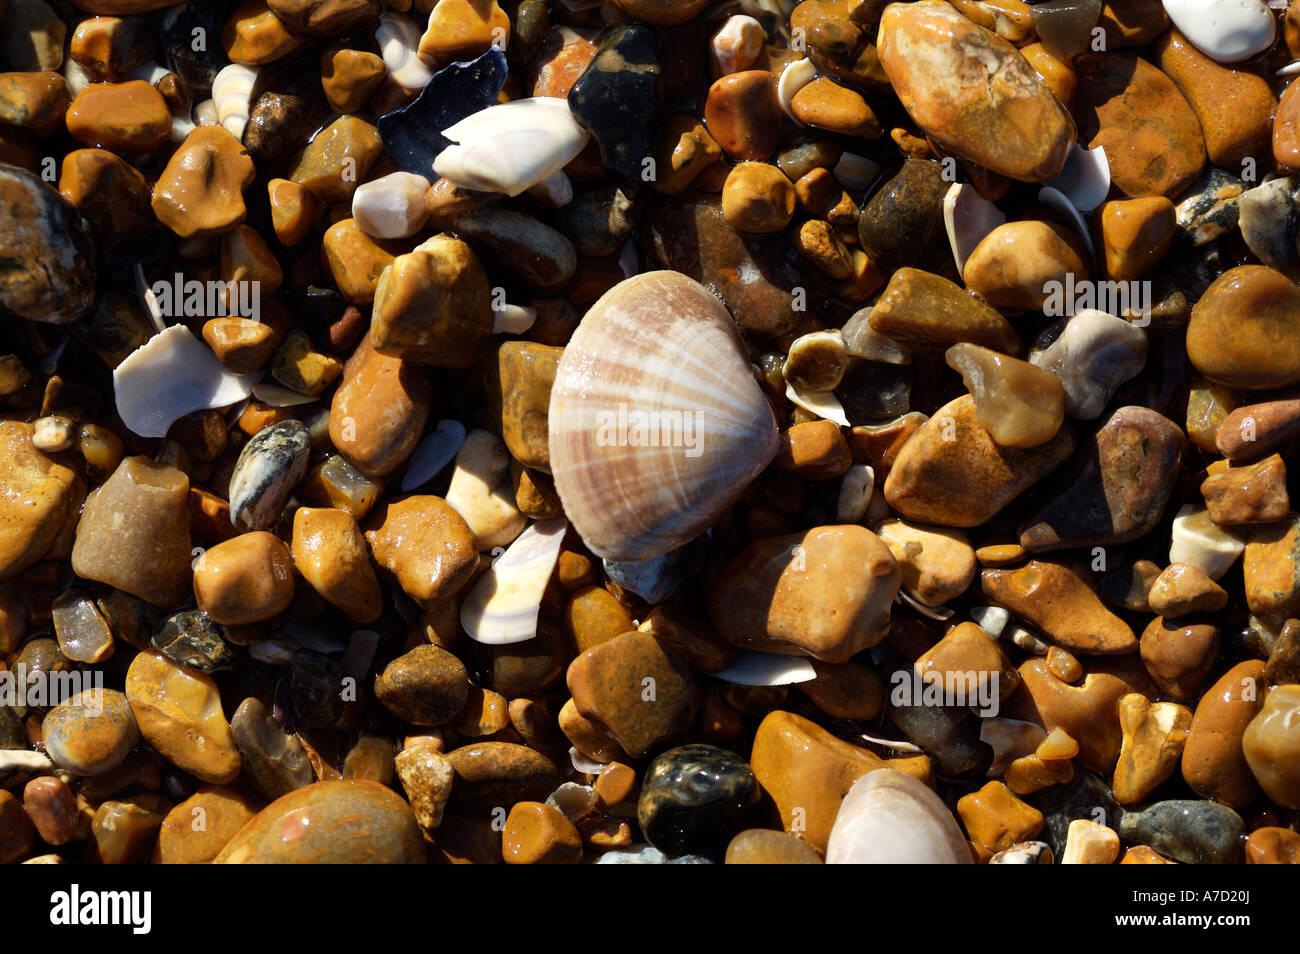 Beach, Pebbles & Shells - Stock Image